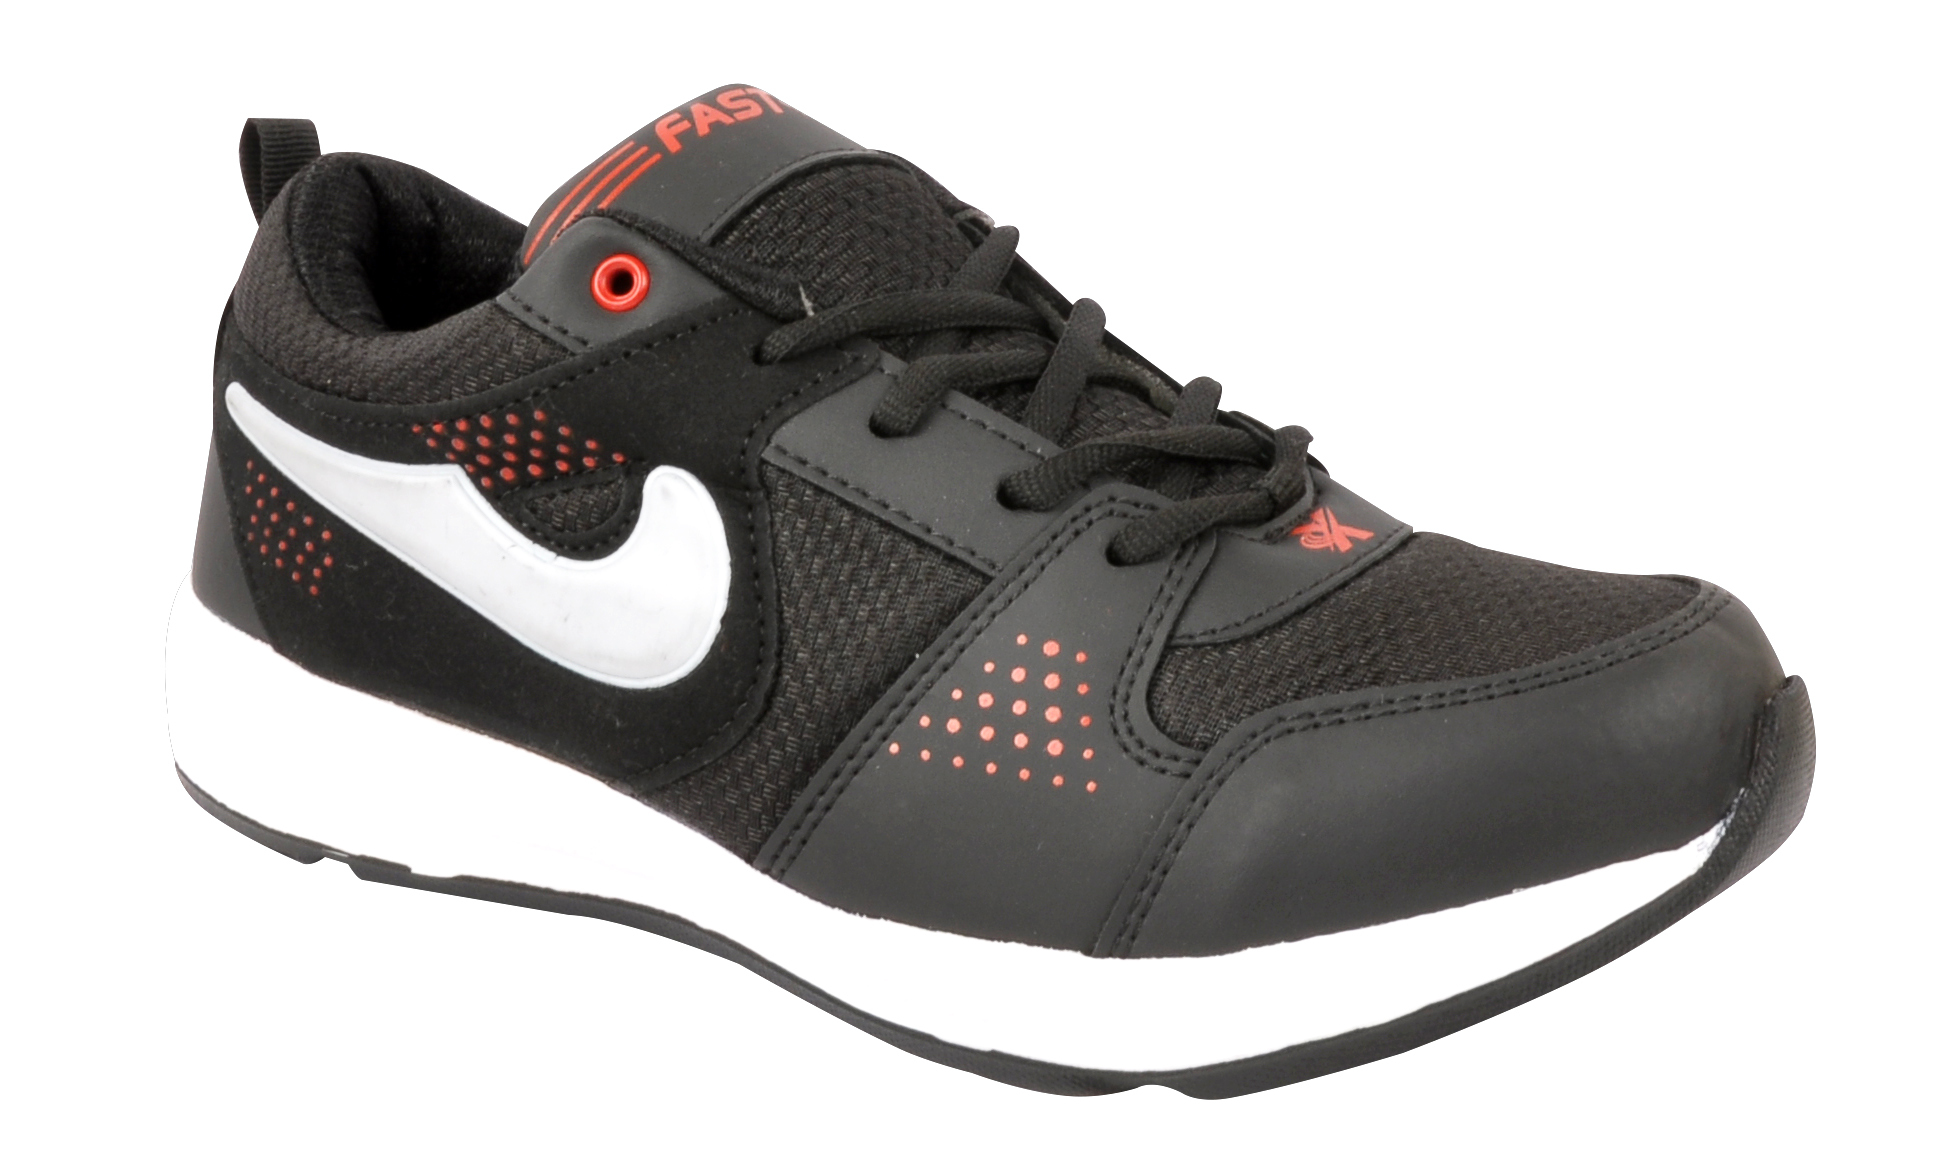 Radium Black & Red Sports Shoes